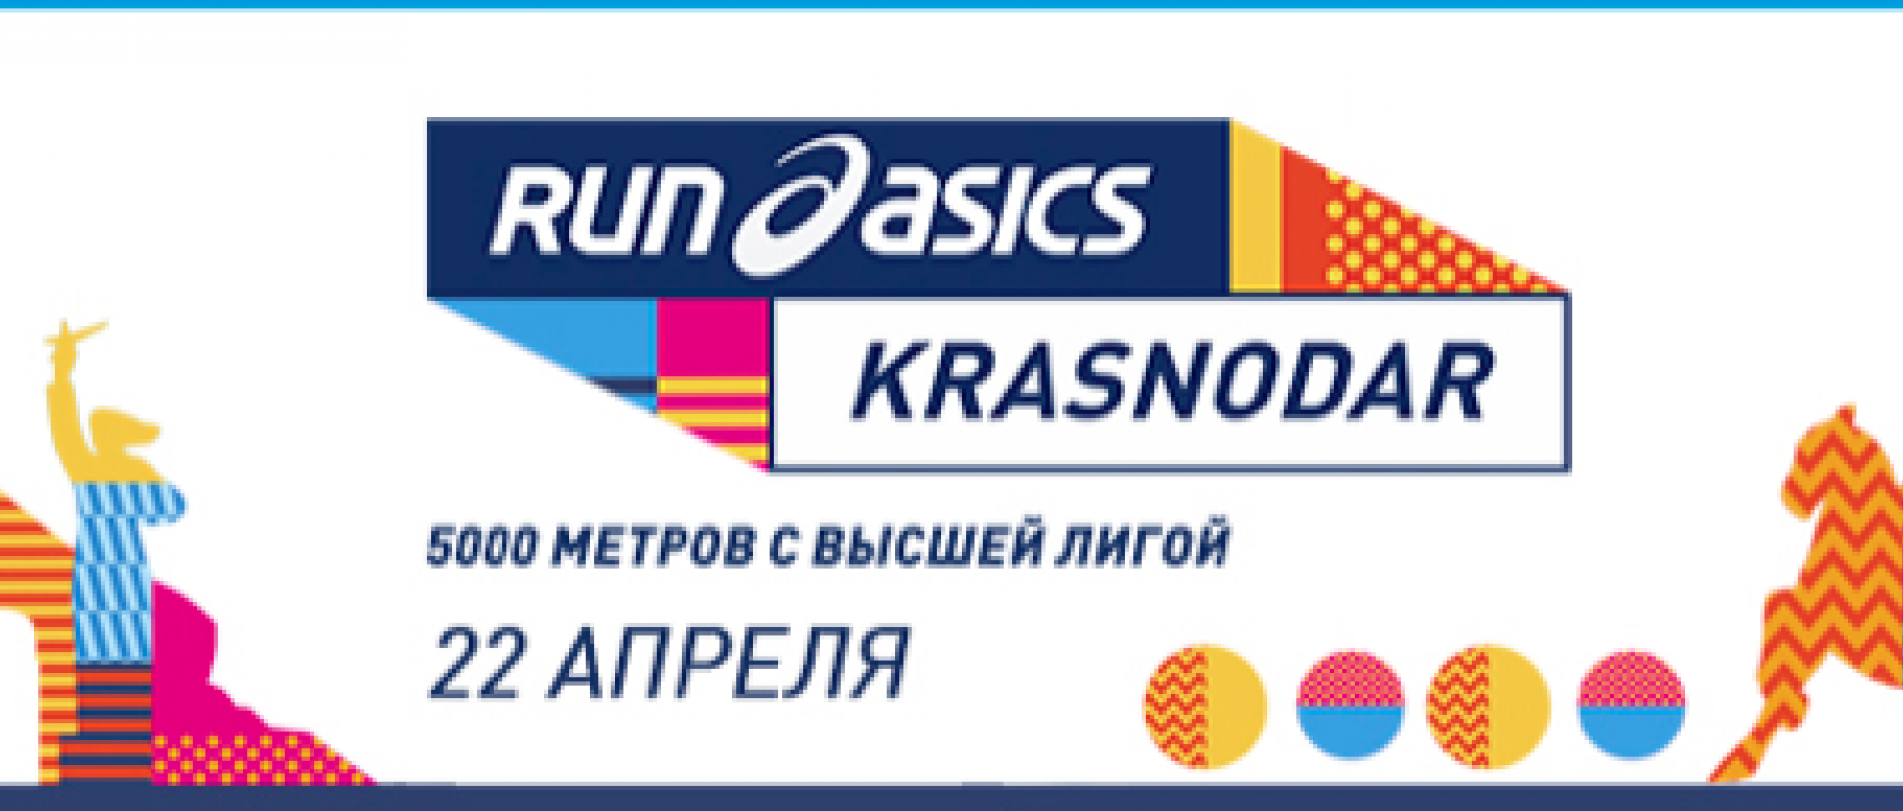 b1cdf114074e Run Asics Krasnodar 2018